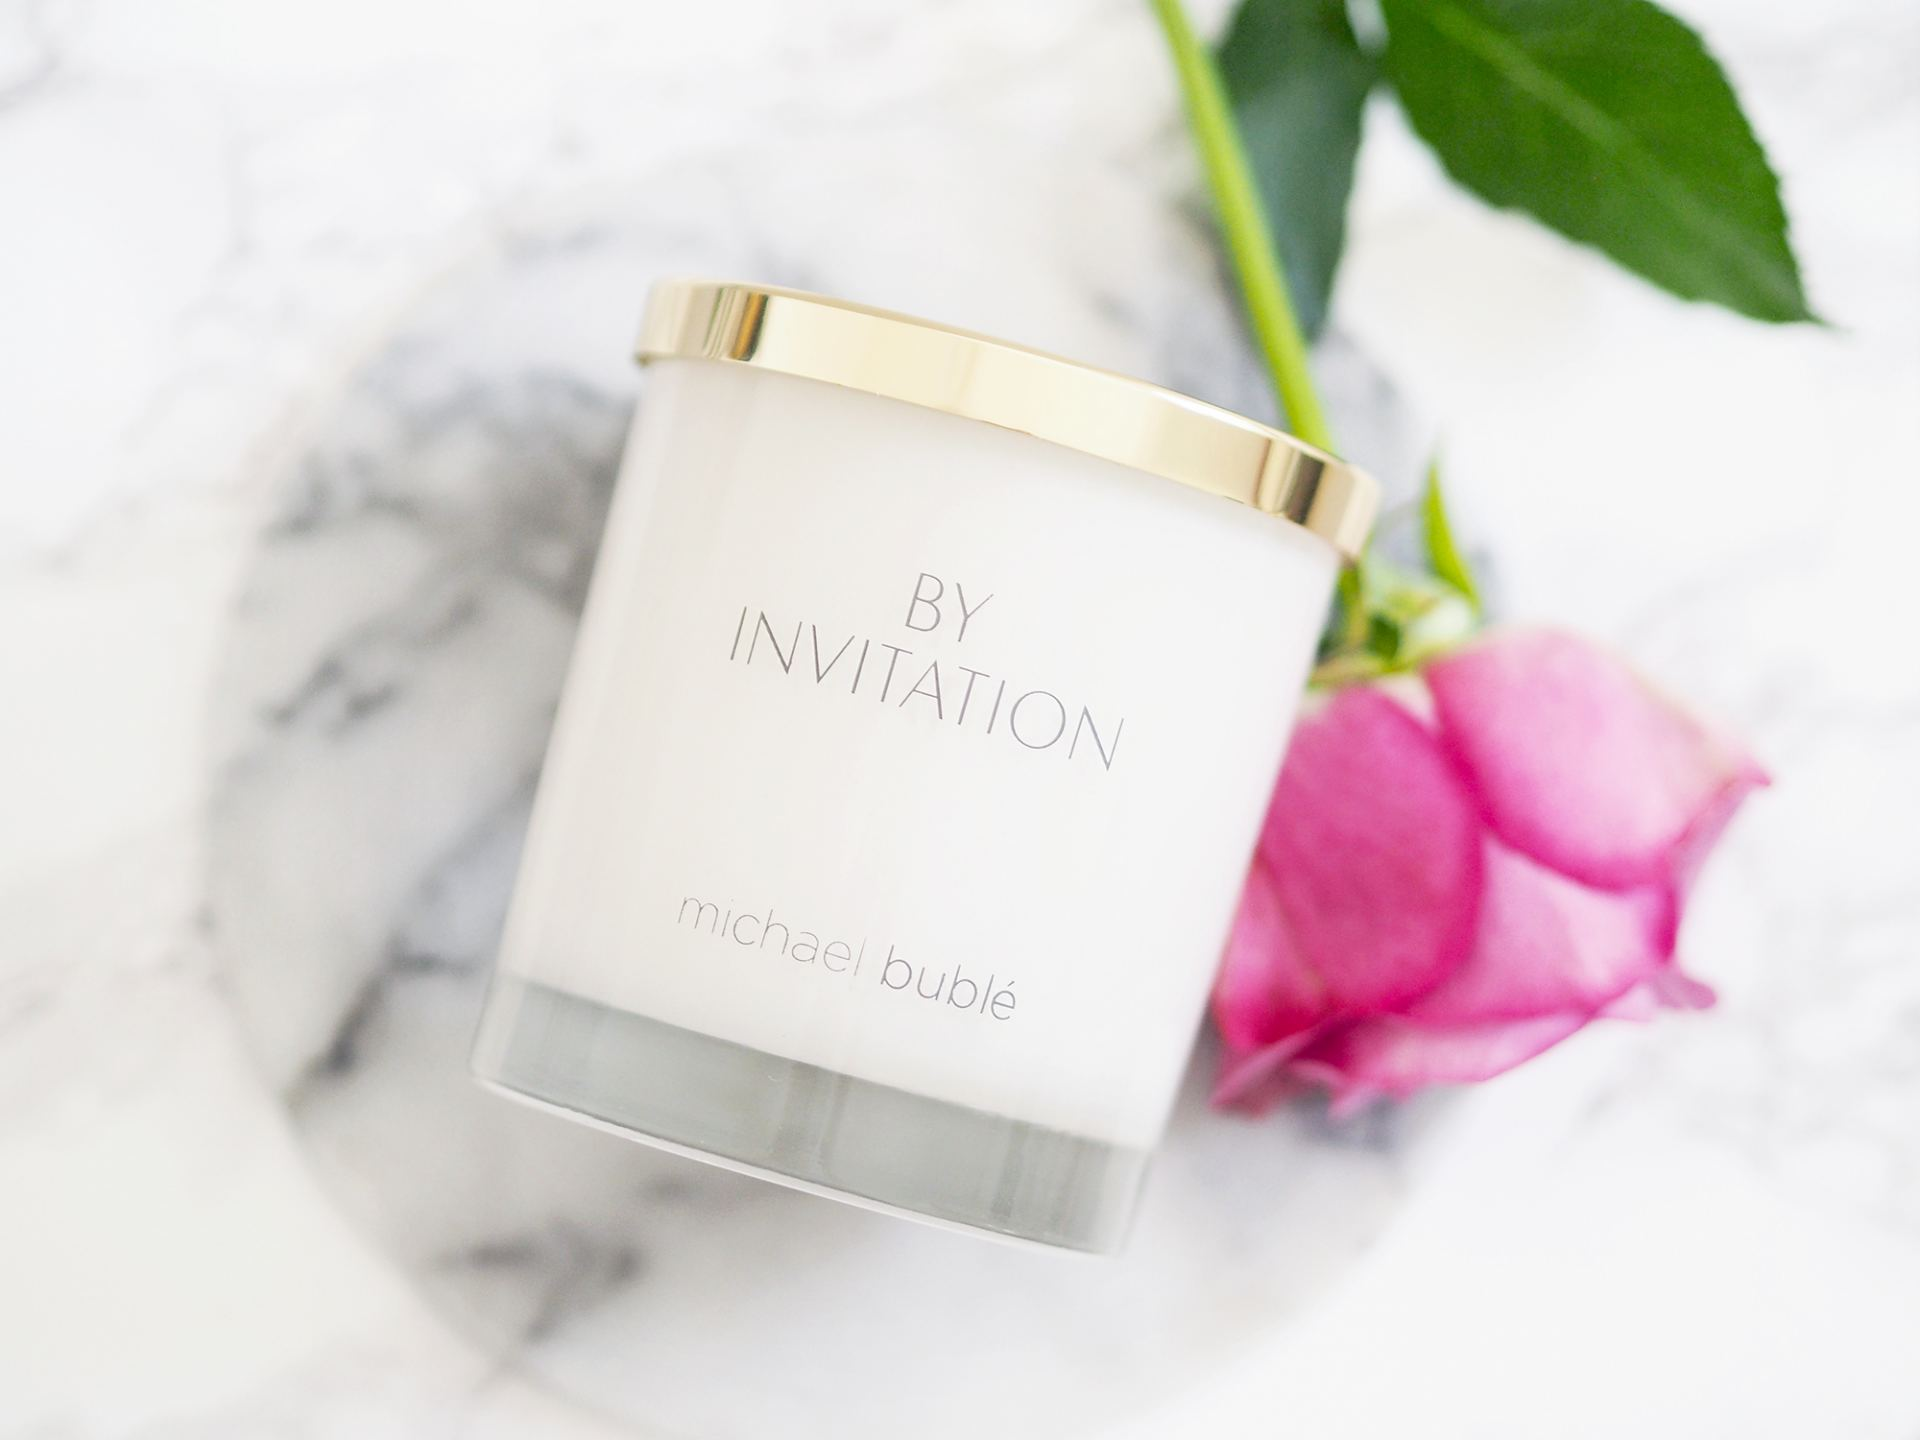 Michael Buble Perfume Win